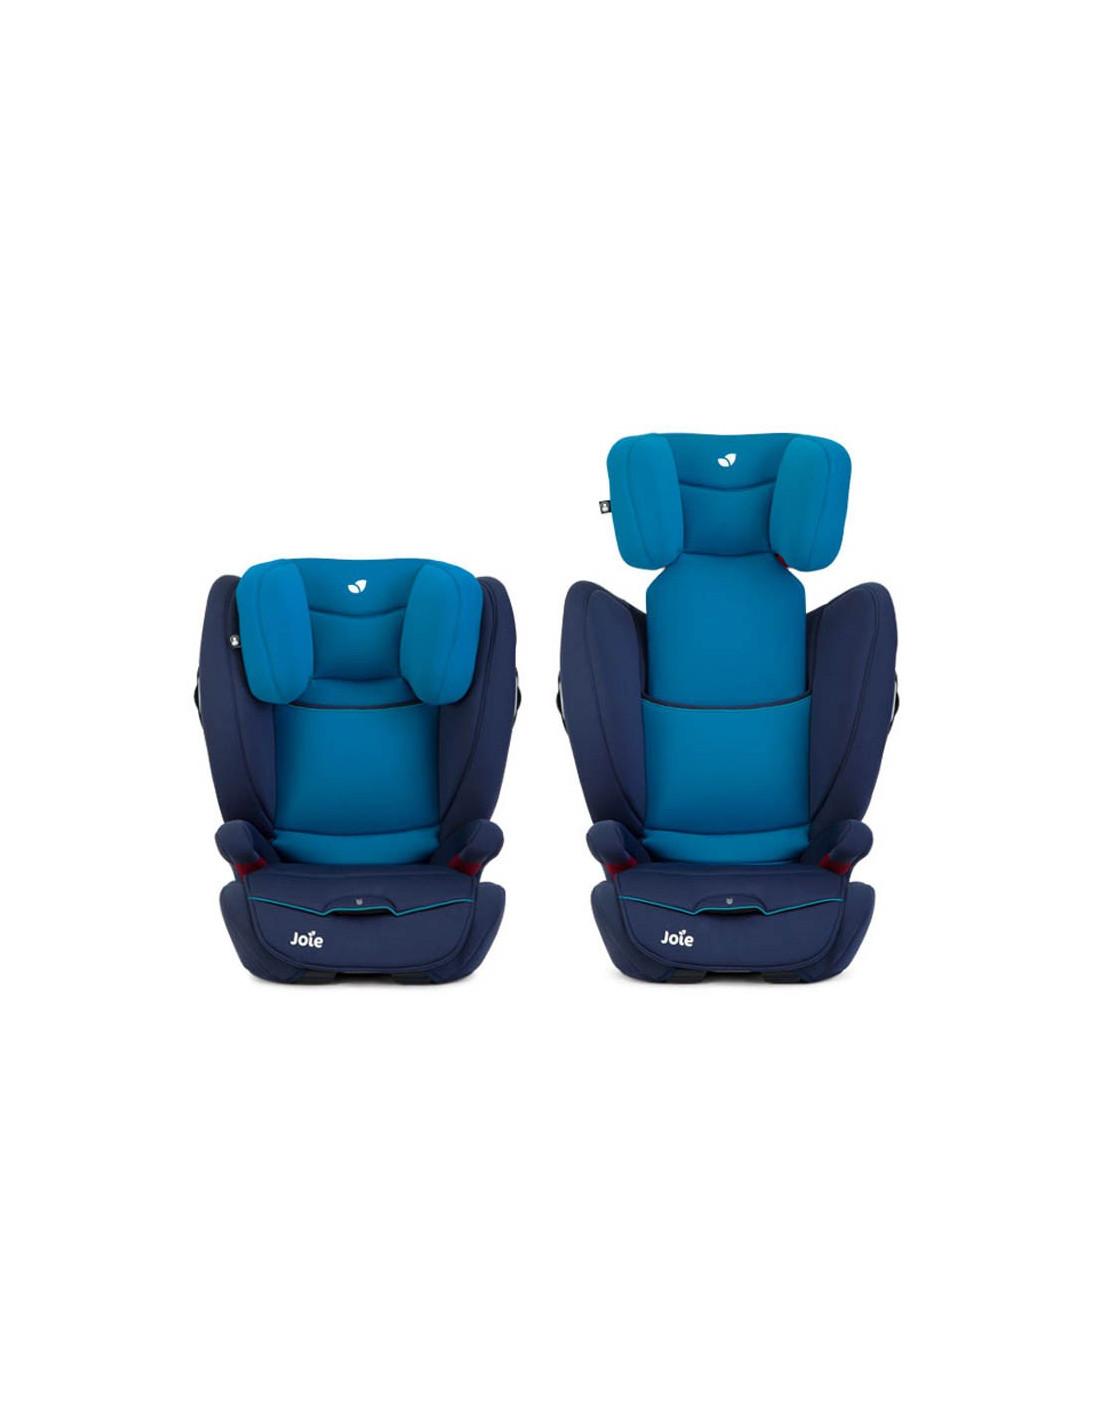 silla de auto isofix 1 2 3 joie trascend caribbean. Black Bedroom Furniture Sets. Home Design Ideas